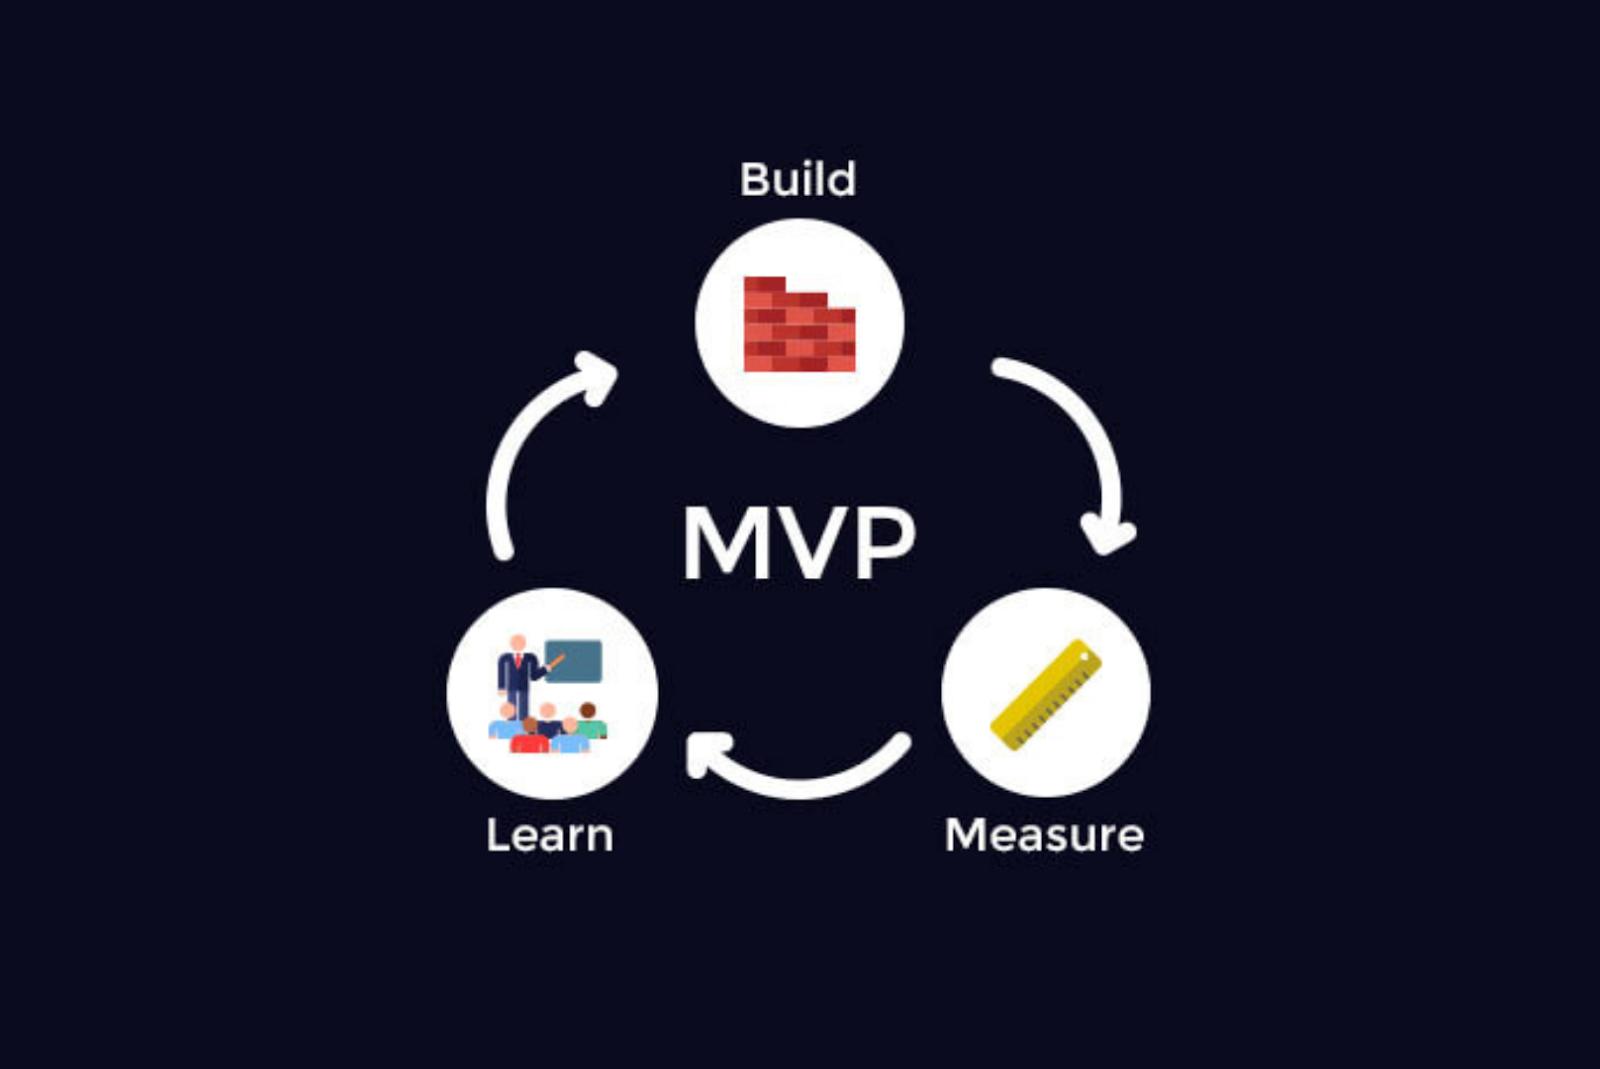 Build a Minimal Viable Product